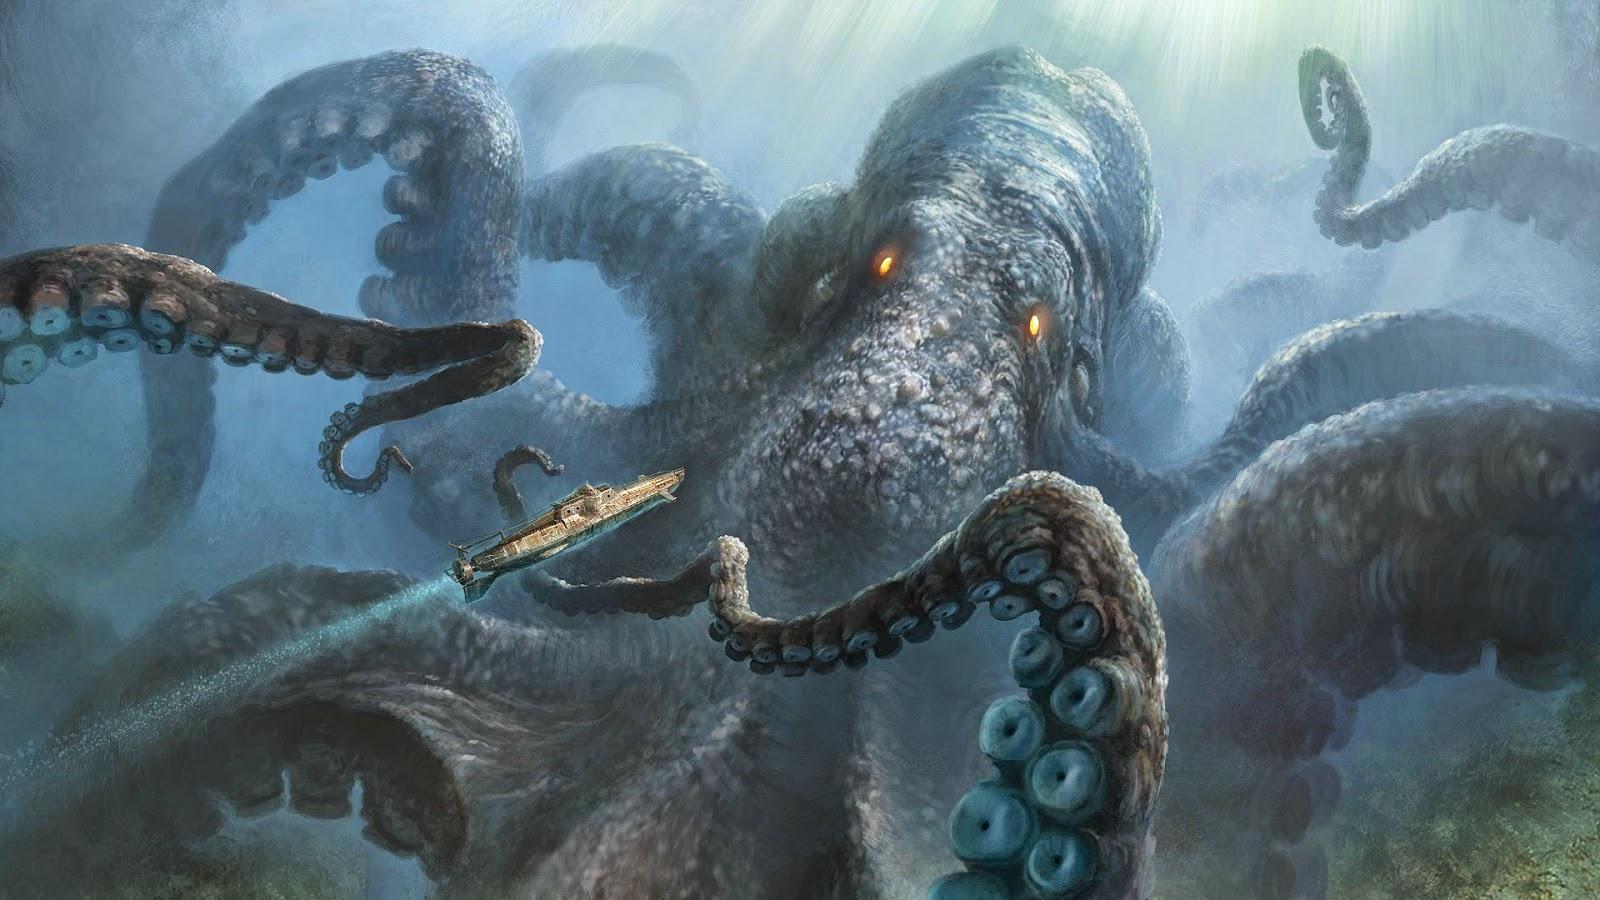 Mitologi Kraken di Norwegia dan Islandia